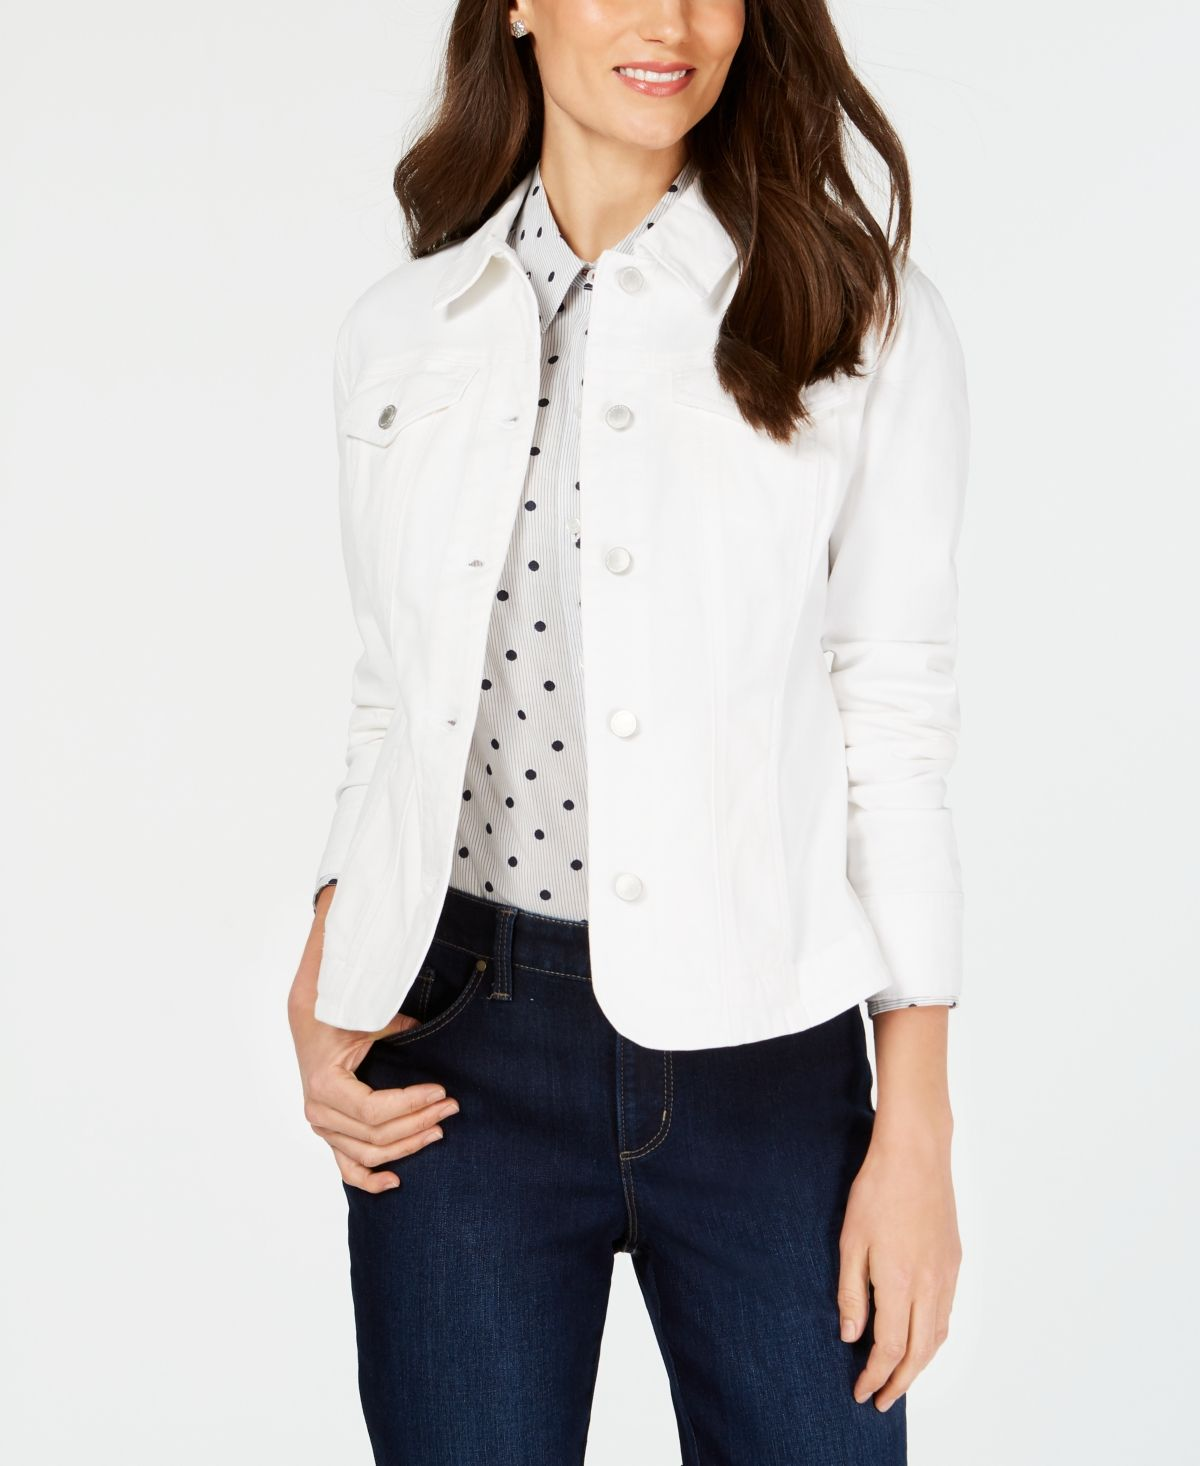 Charter Club Denim Jacket In Regular And Petite Created For Macy S Bright White Petite Denim Jacket Blazer Jackets For Women White Jean Jacket [ 1466 x 1200 Pixel ]